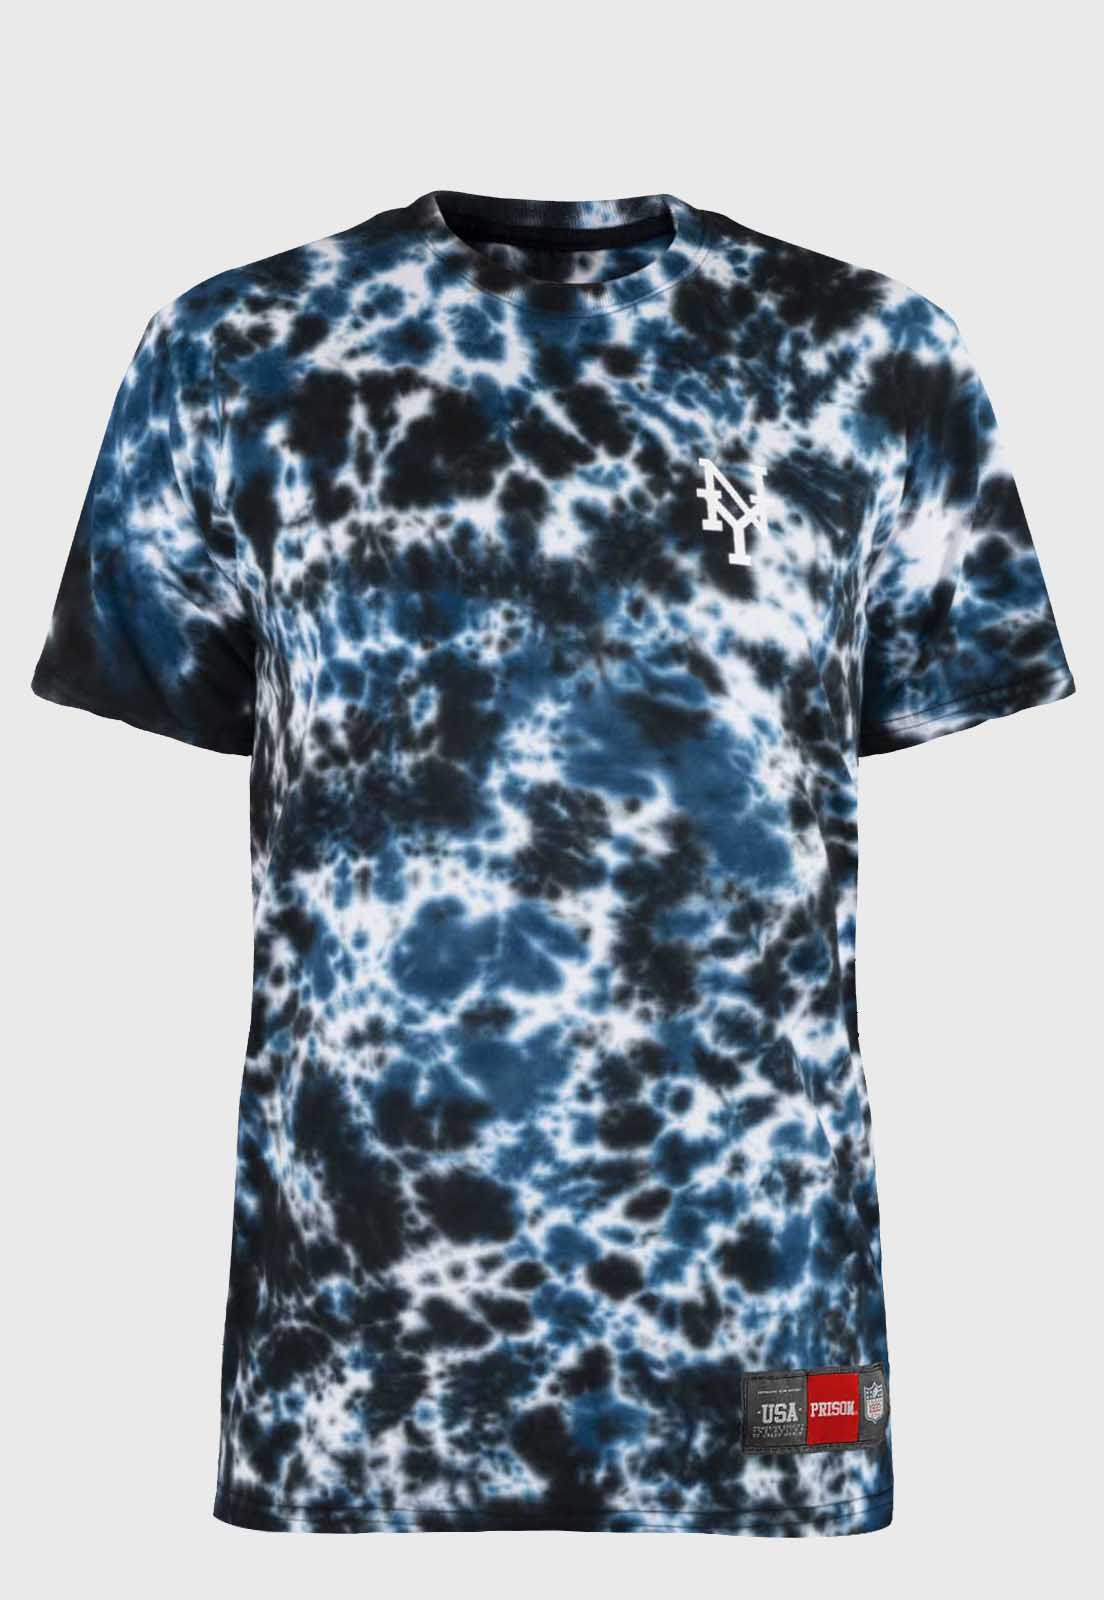 Camiseta Prison Tie Dye Diamond